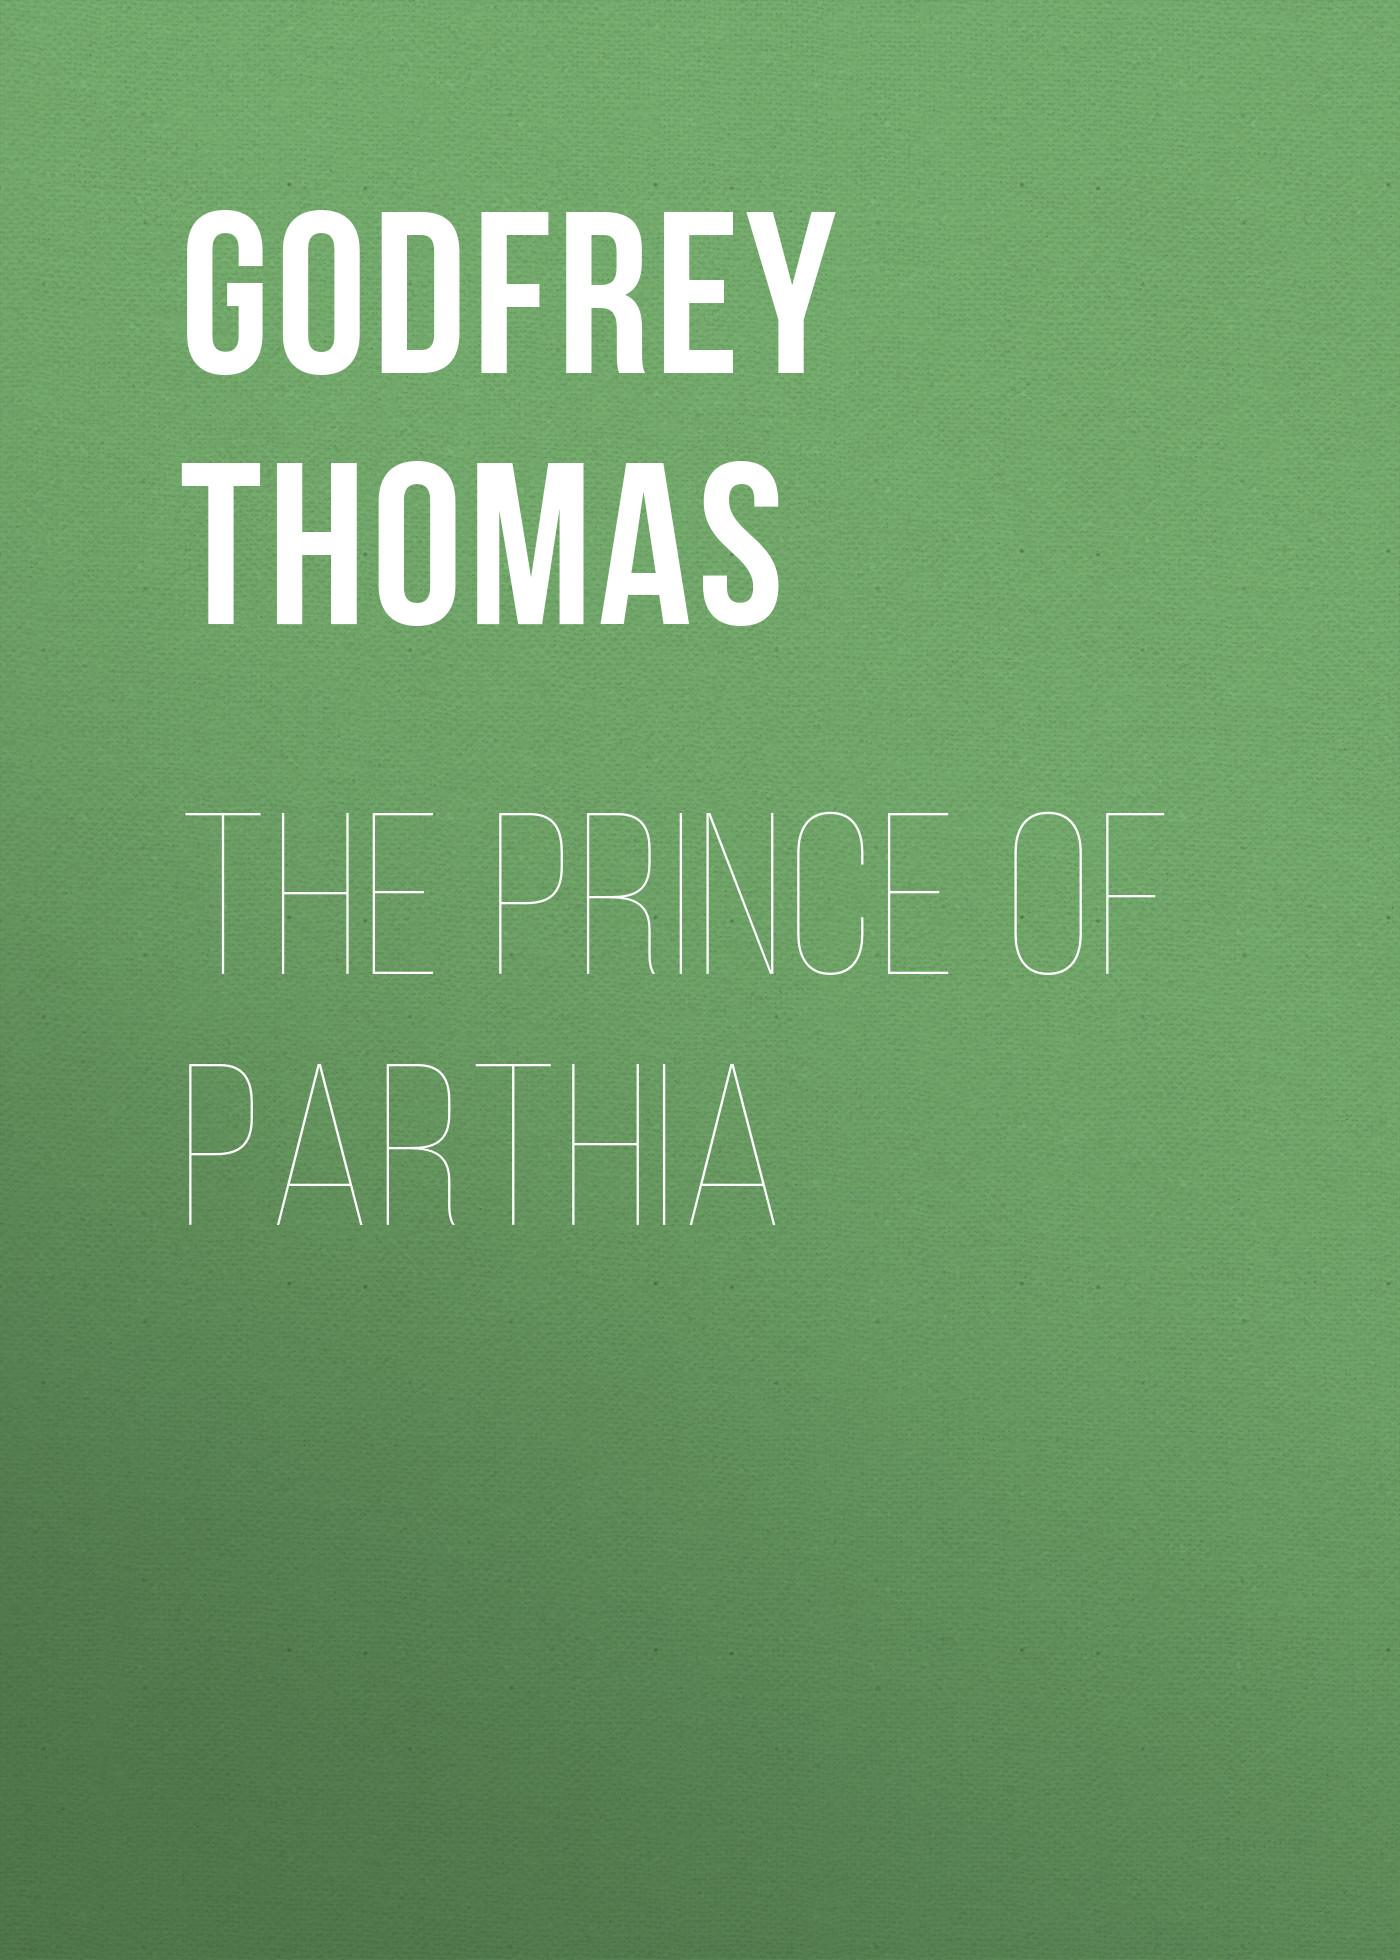 цены Godfrey Thomas The Prince of Parthia